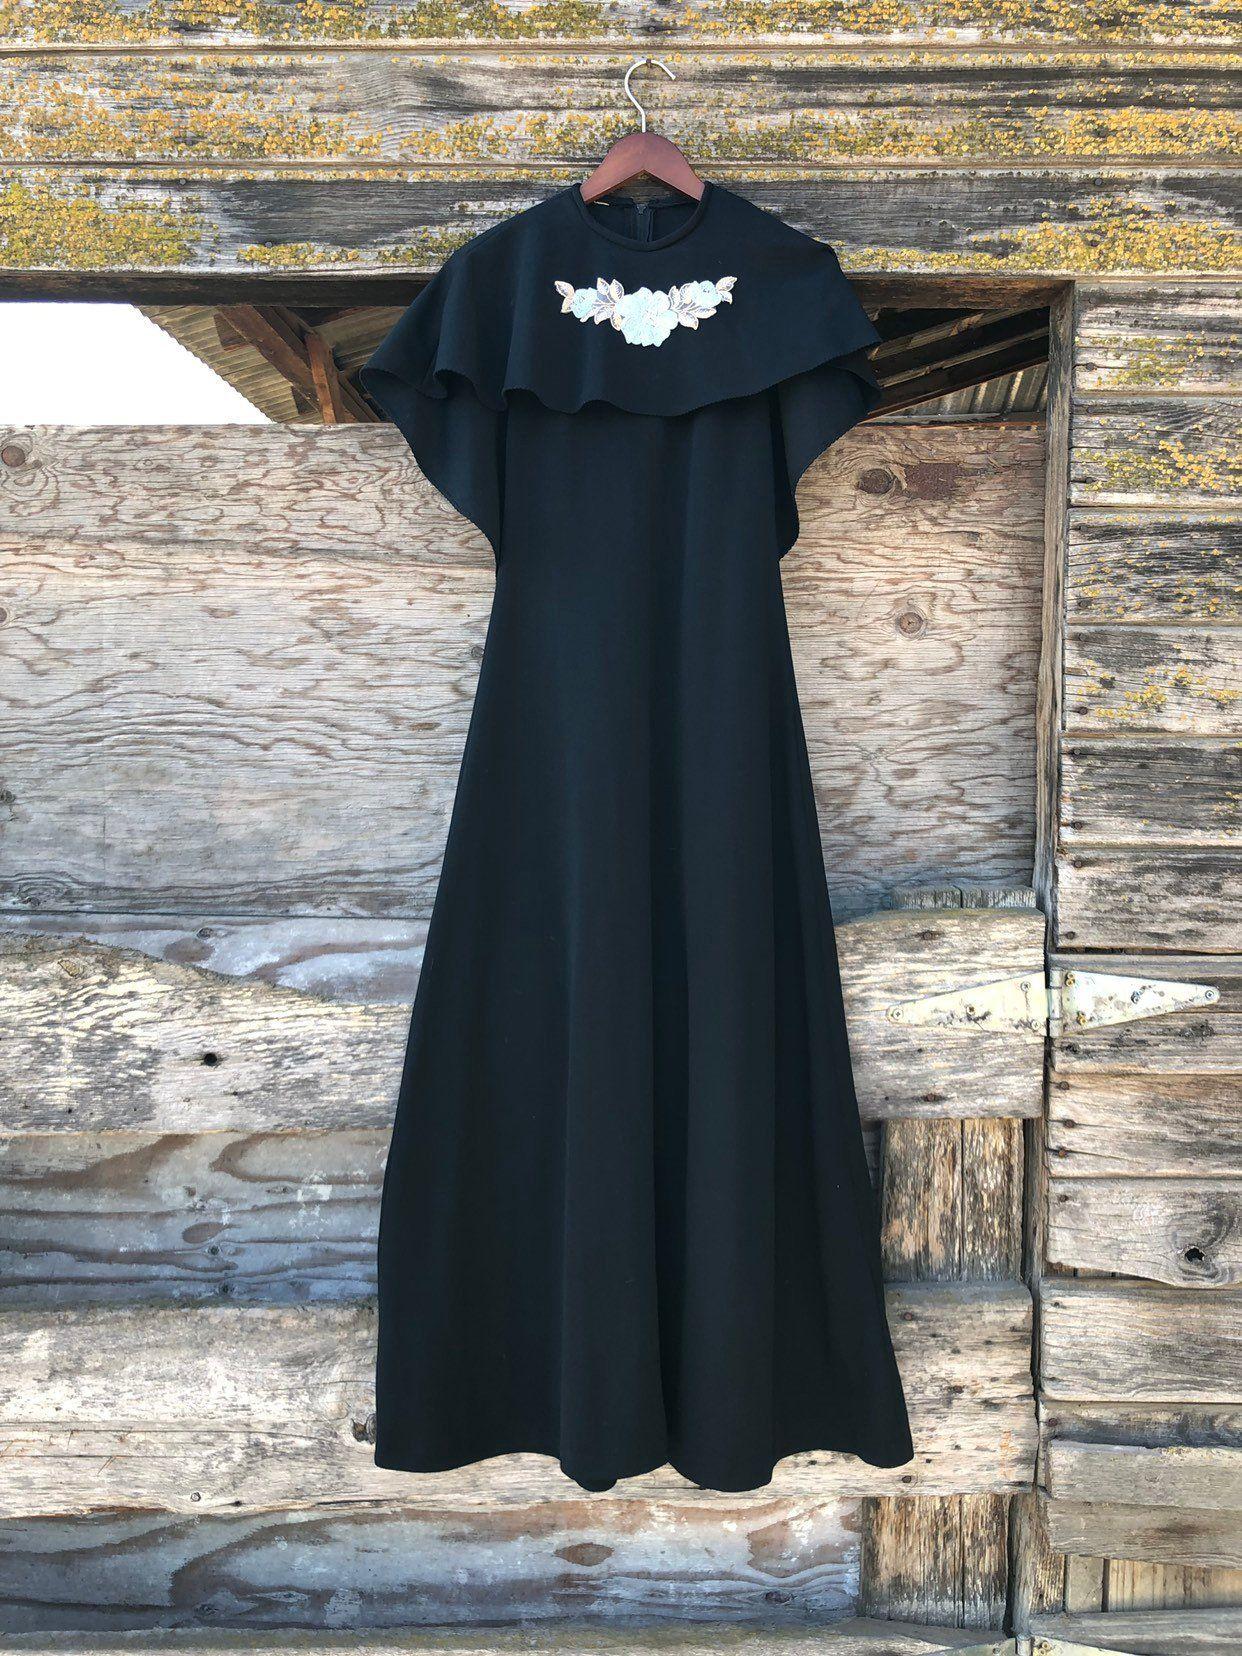 Vintage Black Witch Dress Capelet S Small Batwing Cape 60s Etsy Floral Dress Black Black Witch Dress 60s Maxi Dress [ 1656 x 1242 Pixel ]